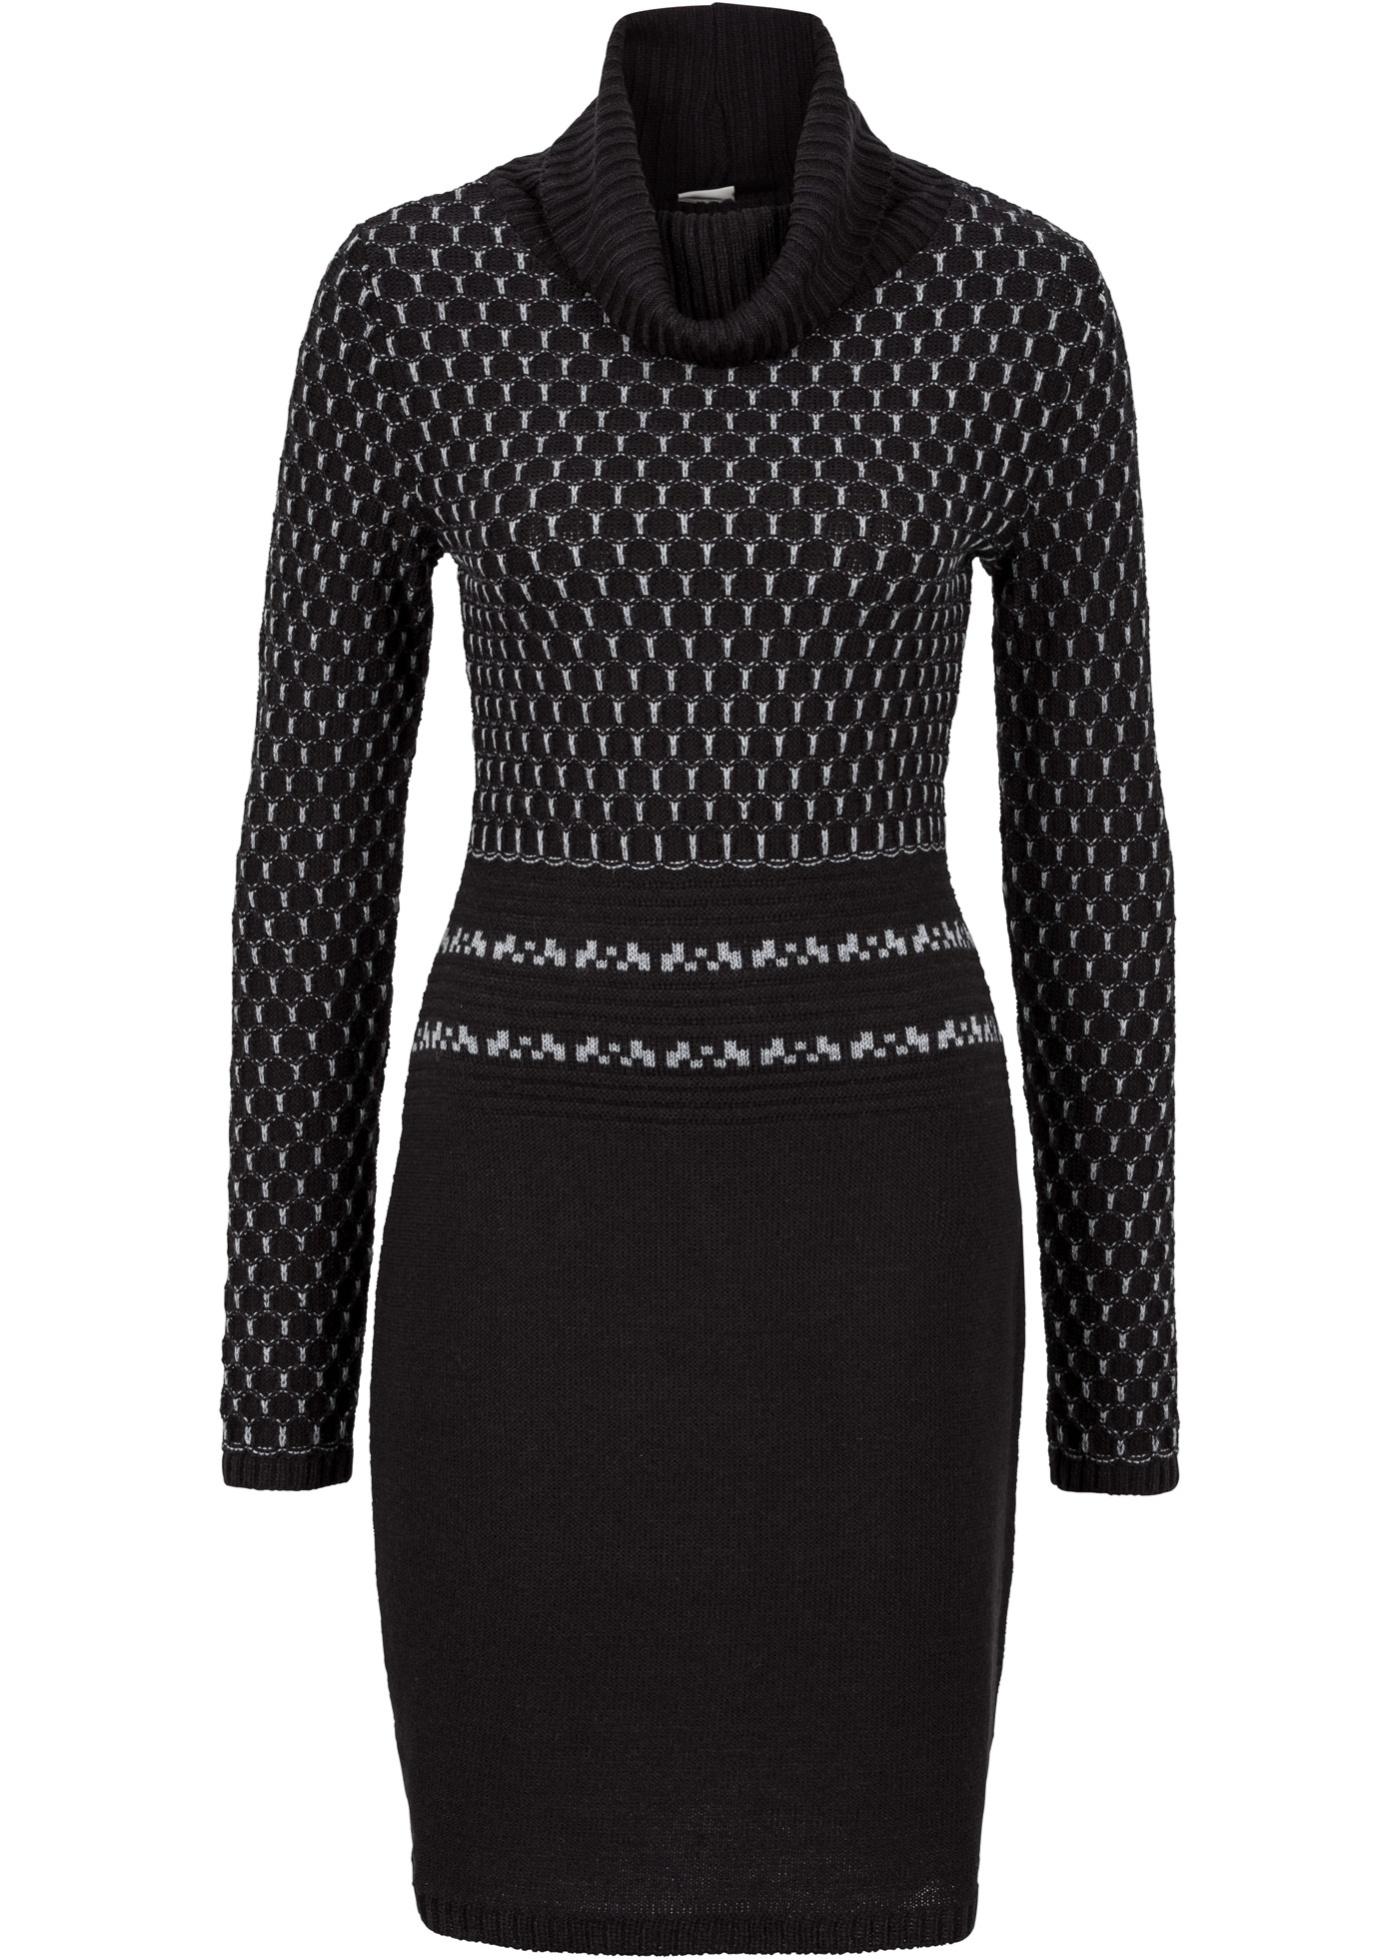 feminines langarm strickkleid kleid mit rollkragen schwarz. Black Bedroom Furniture Sets. Home Design Ideas